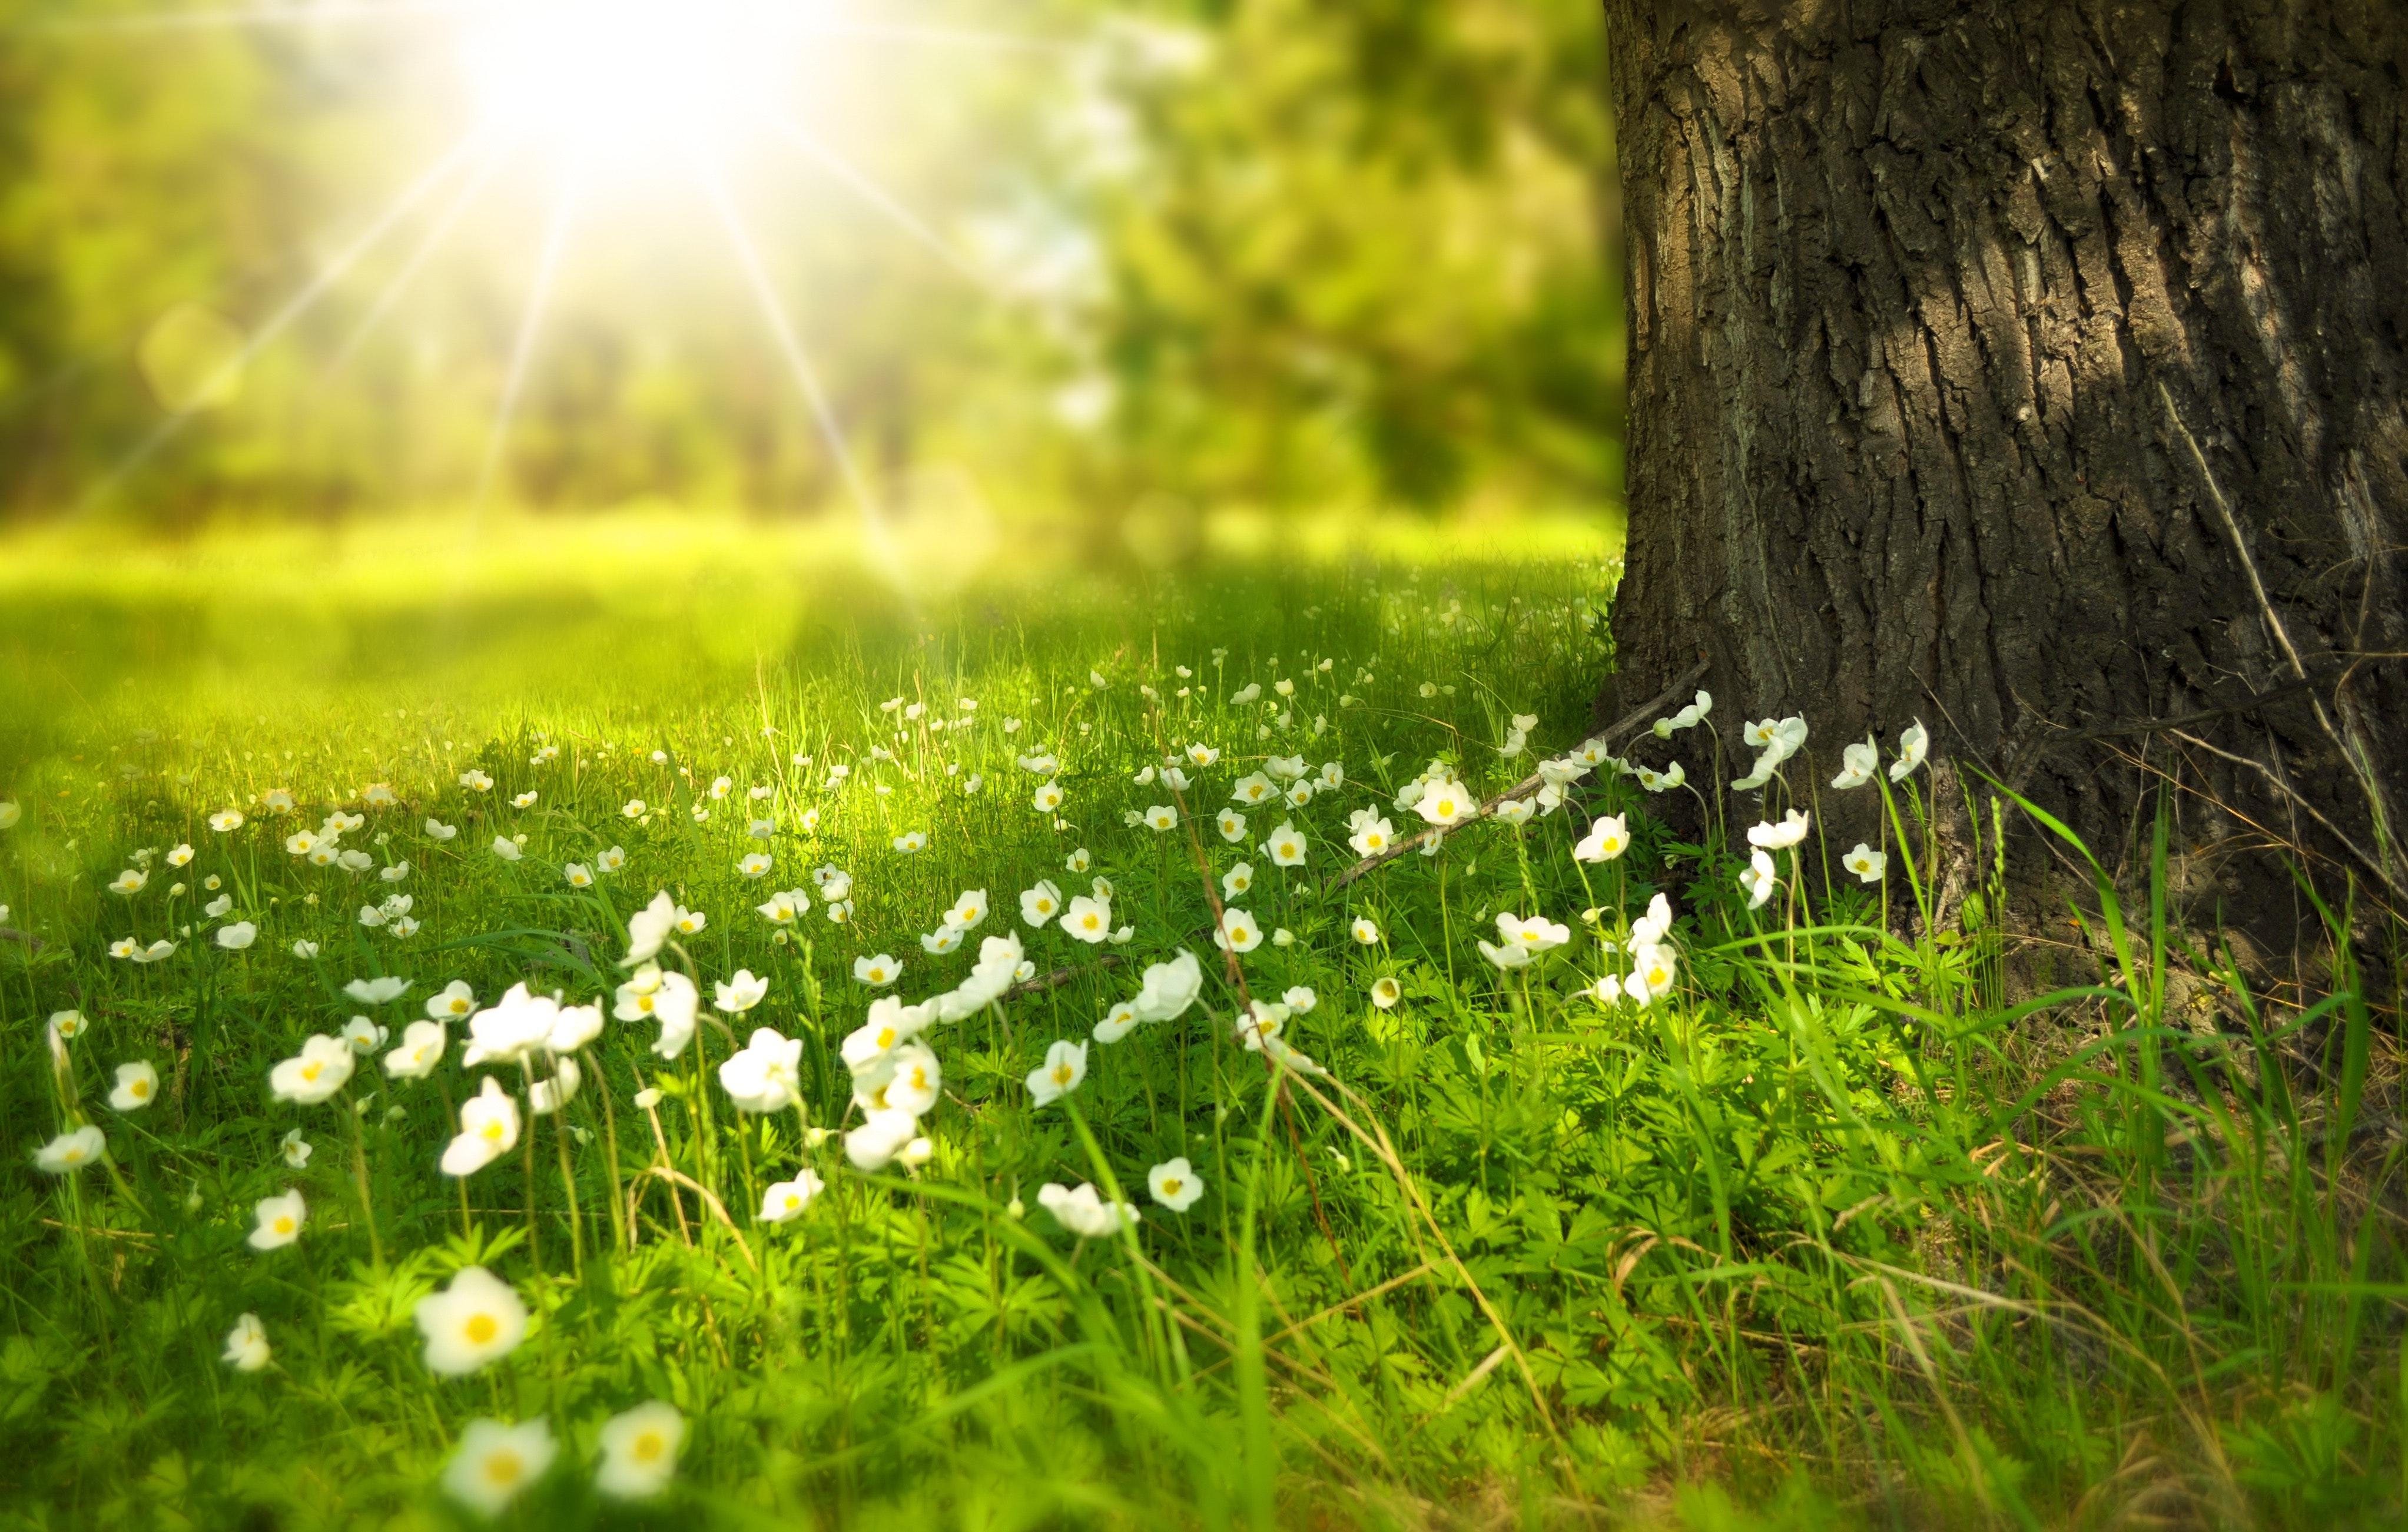 white blooming flowers under tree